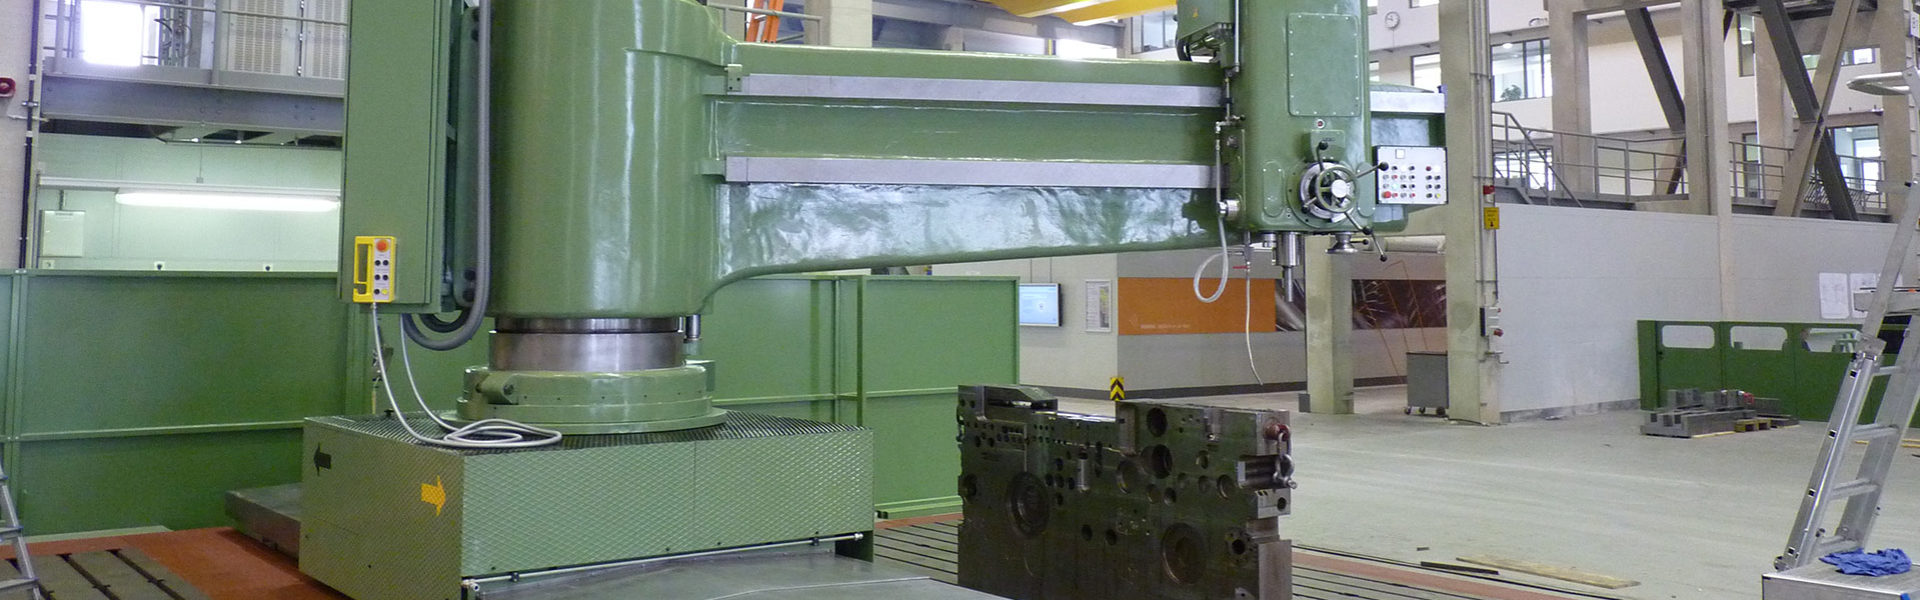 Radialbohrmaschine Headerbild